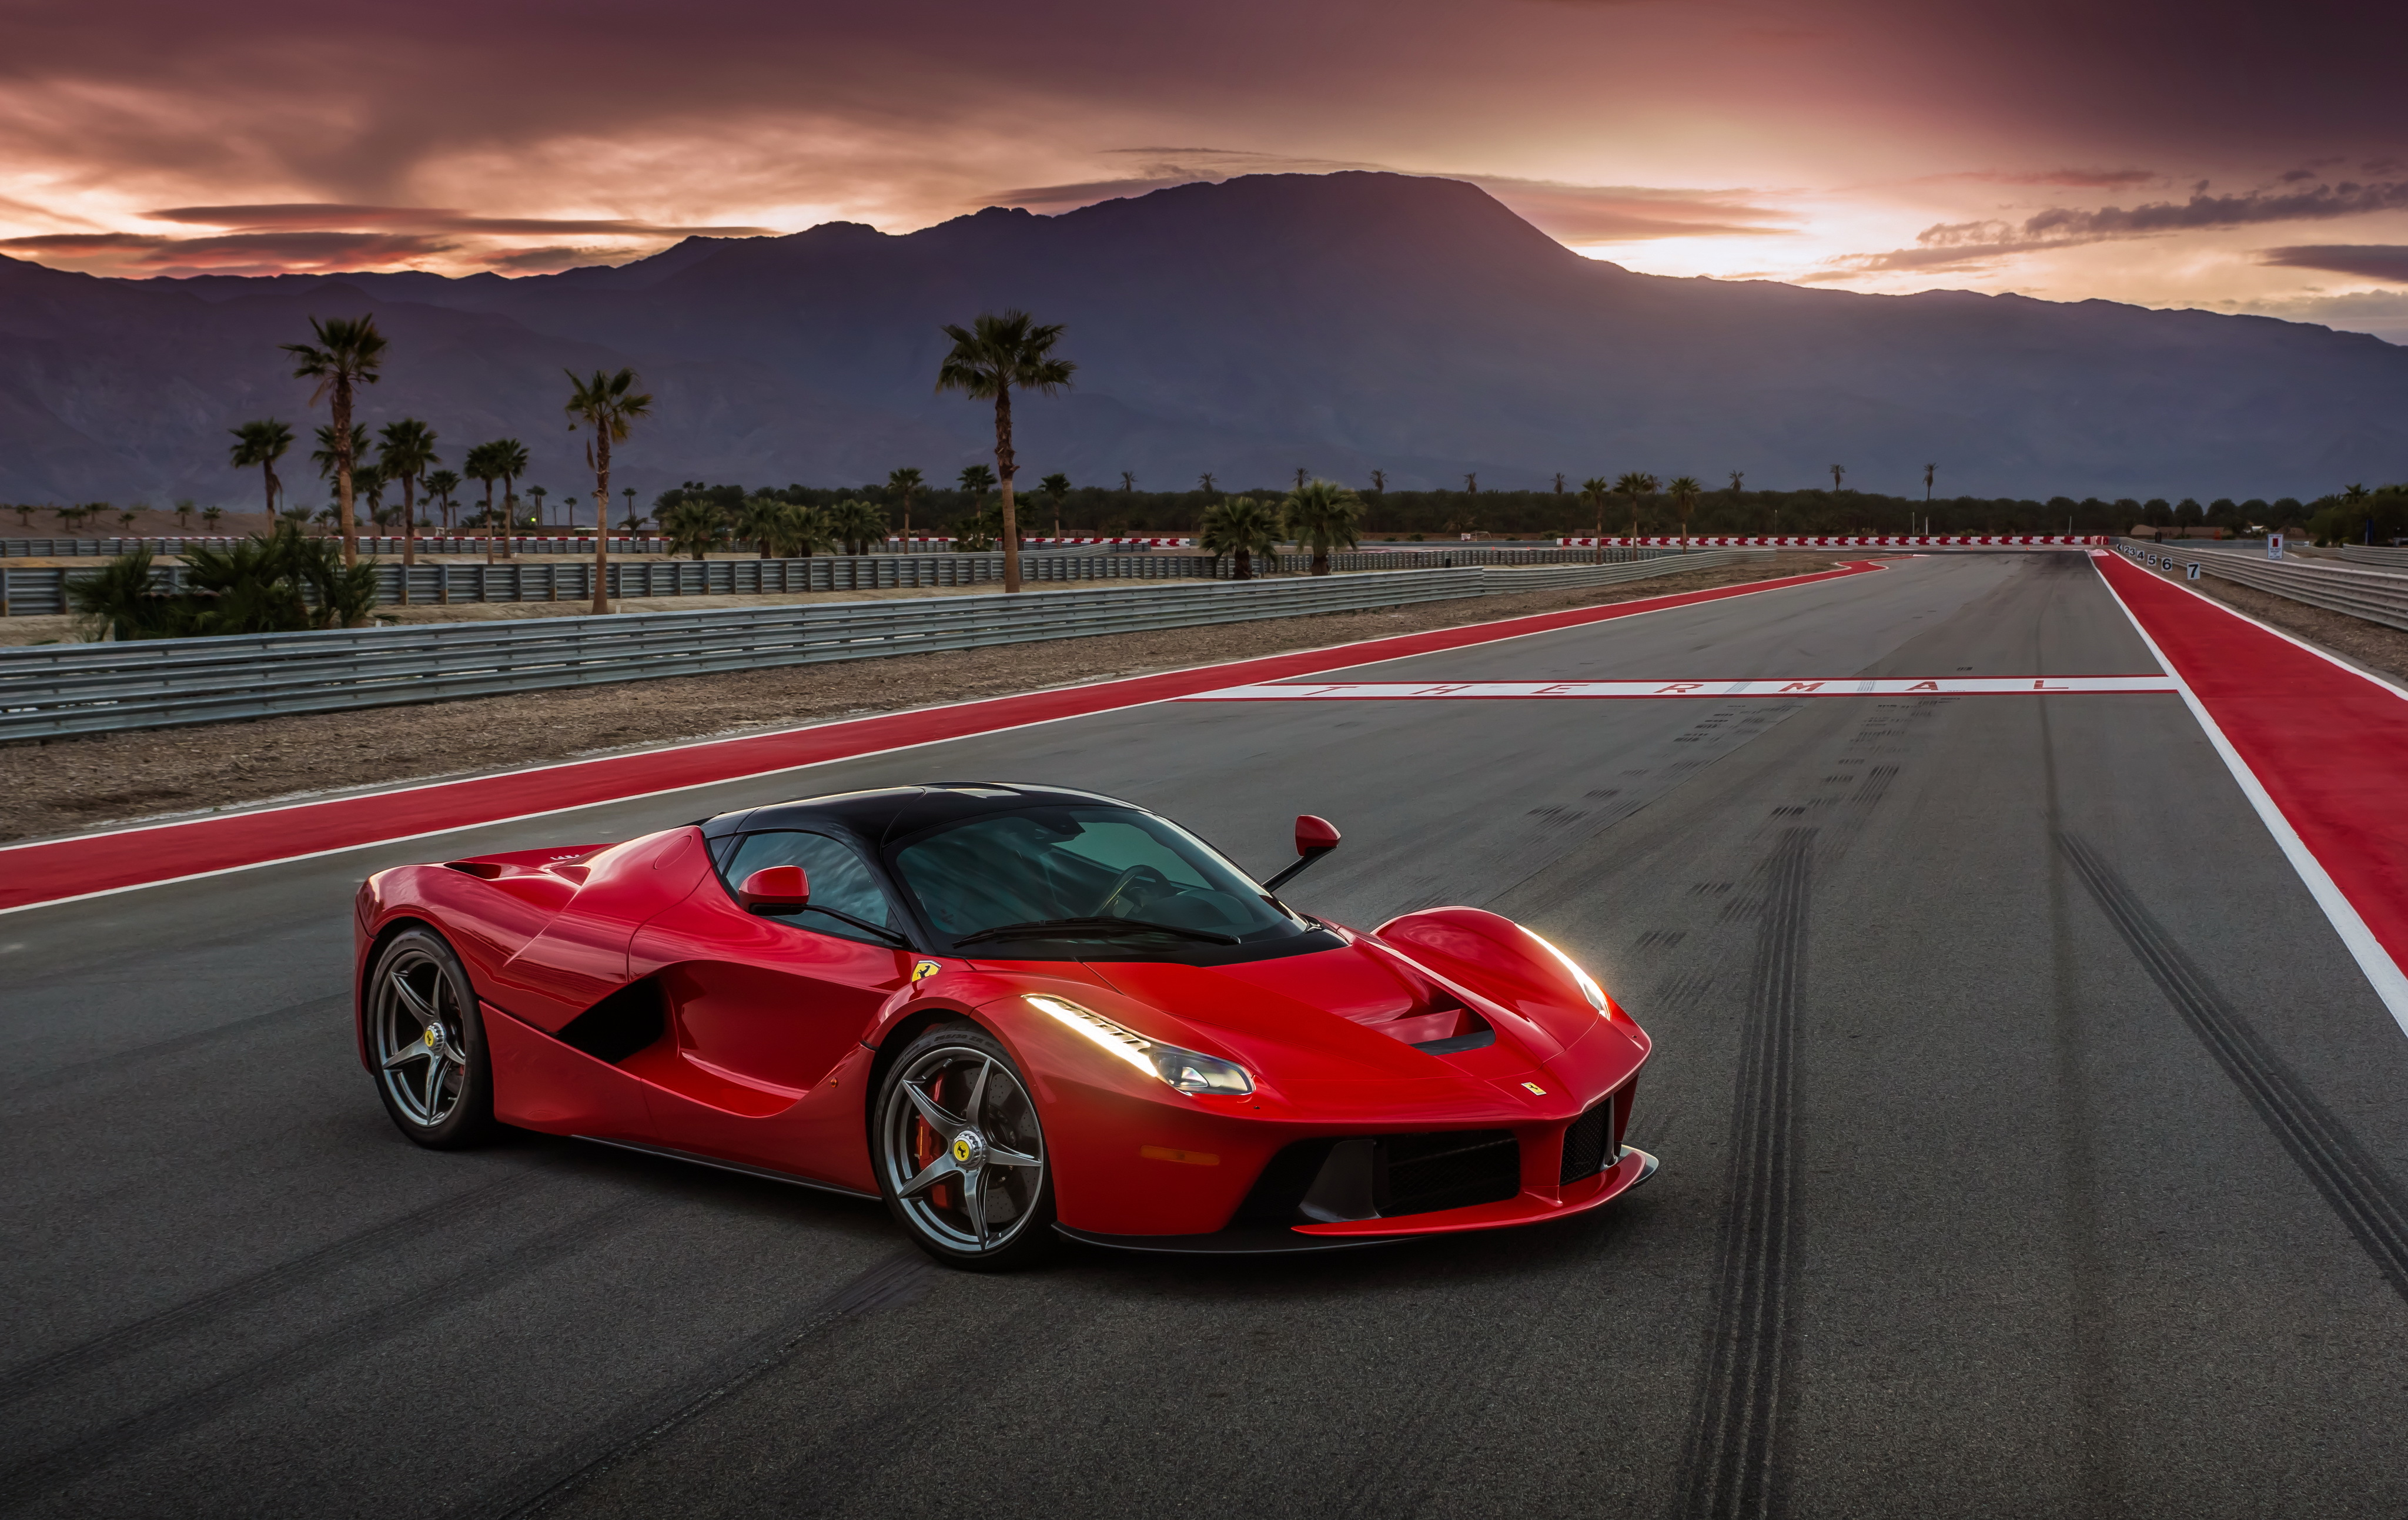 Ferrari Car Wallpaper For Mobile Ferrari Laferrari Red Supercar 4k